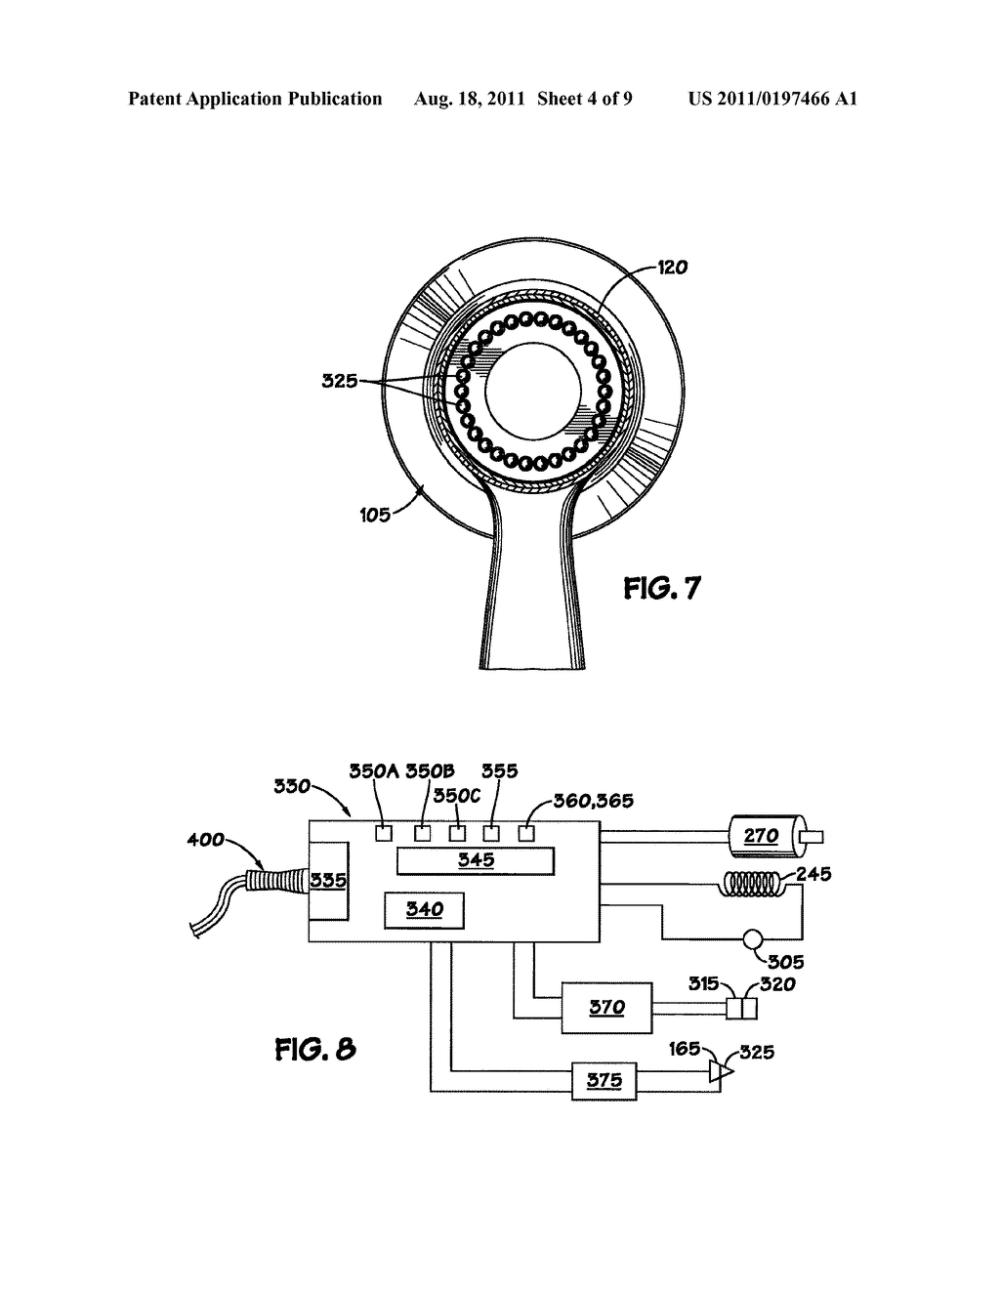 medium resolution of hair dryer diagram schematic and image 05hair dryer diagram 11